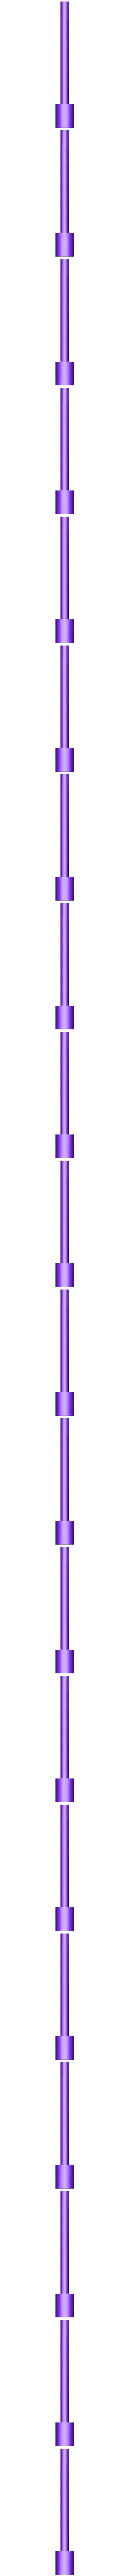 Thumper_v1_part4.stl Download free STL file Dune Thumper • Design to 3D print, poblocki1982